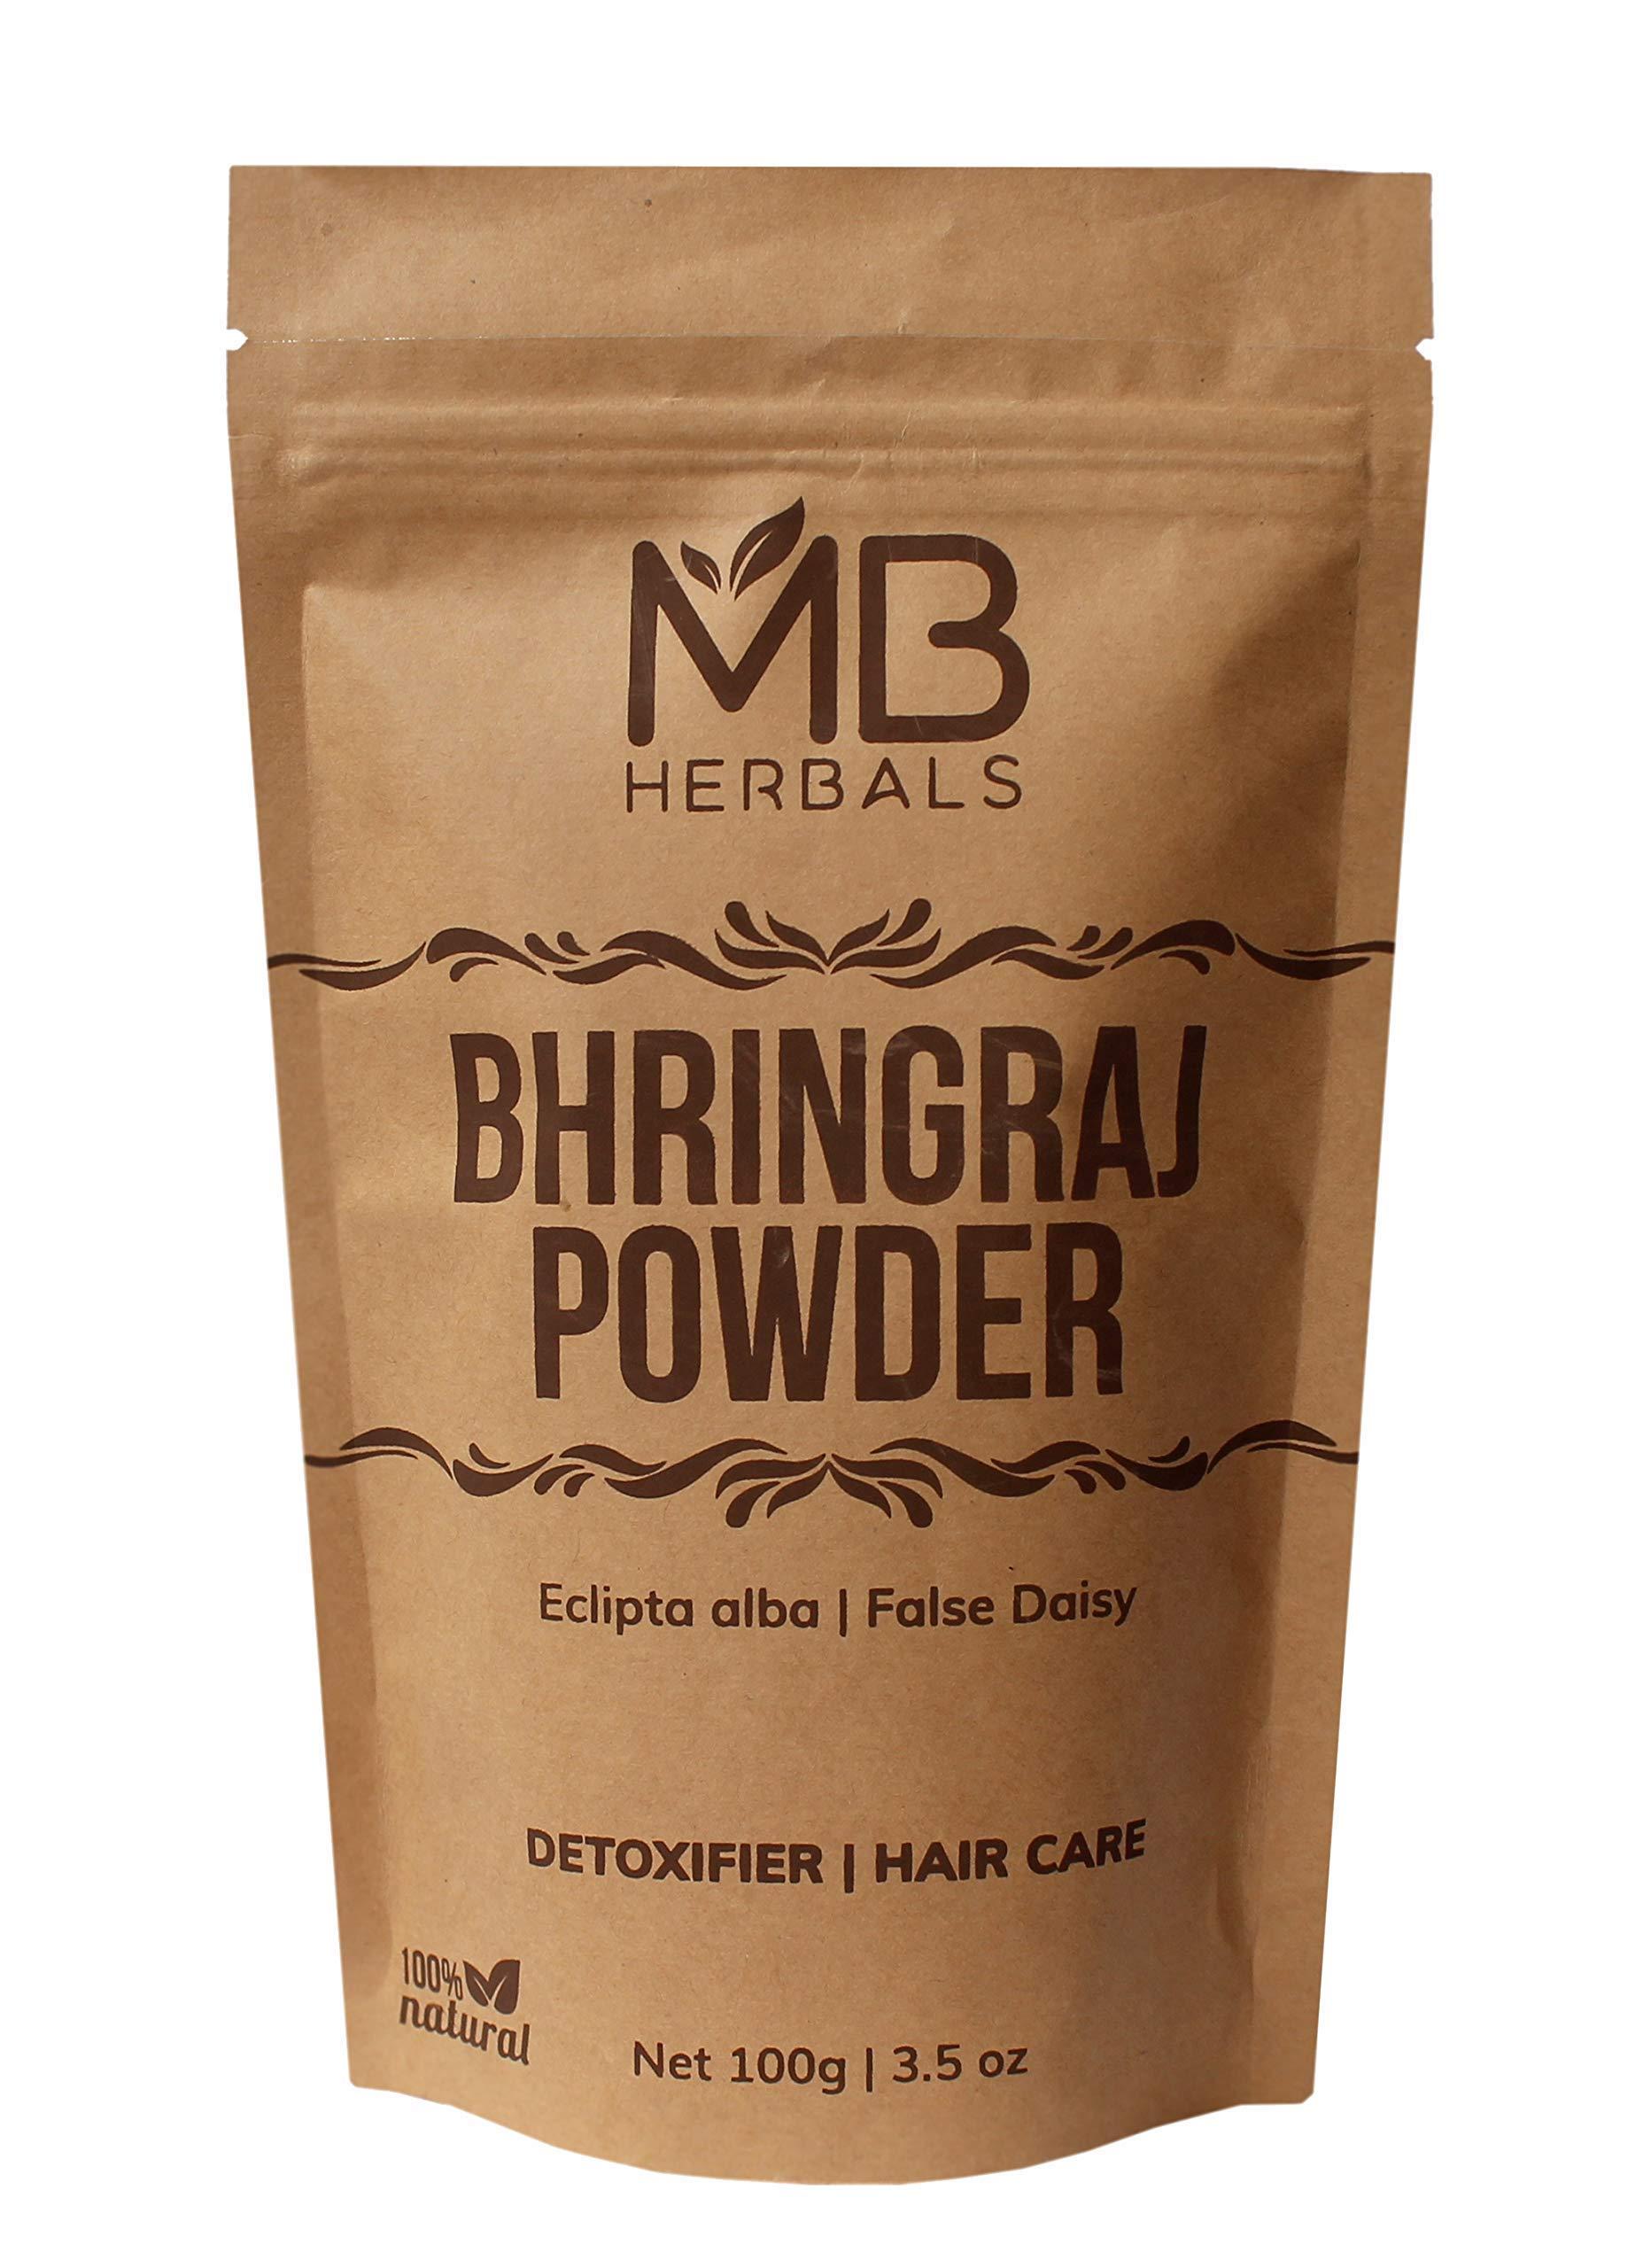 MB Herbals Pure Bhringraj Powder 100 Grams   Pure Bhringaraj Eclipta Alba Powder Promotes Healthy Hair Growth